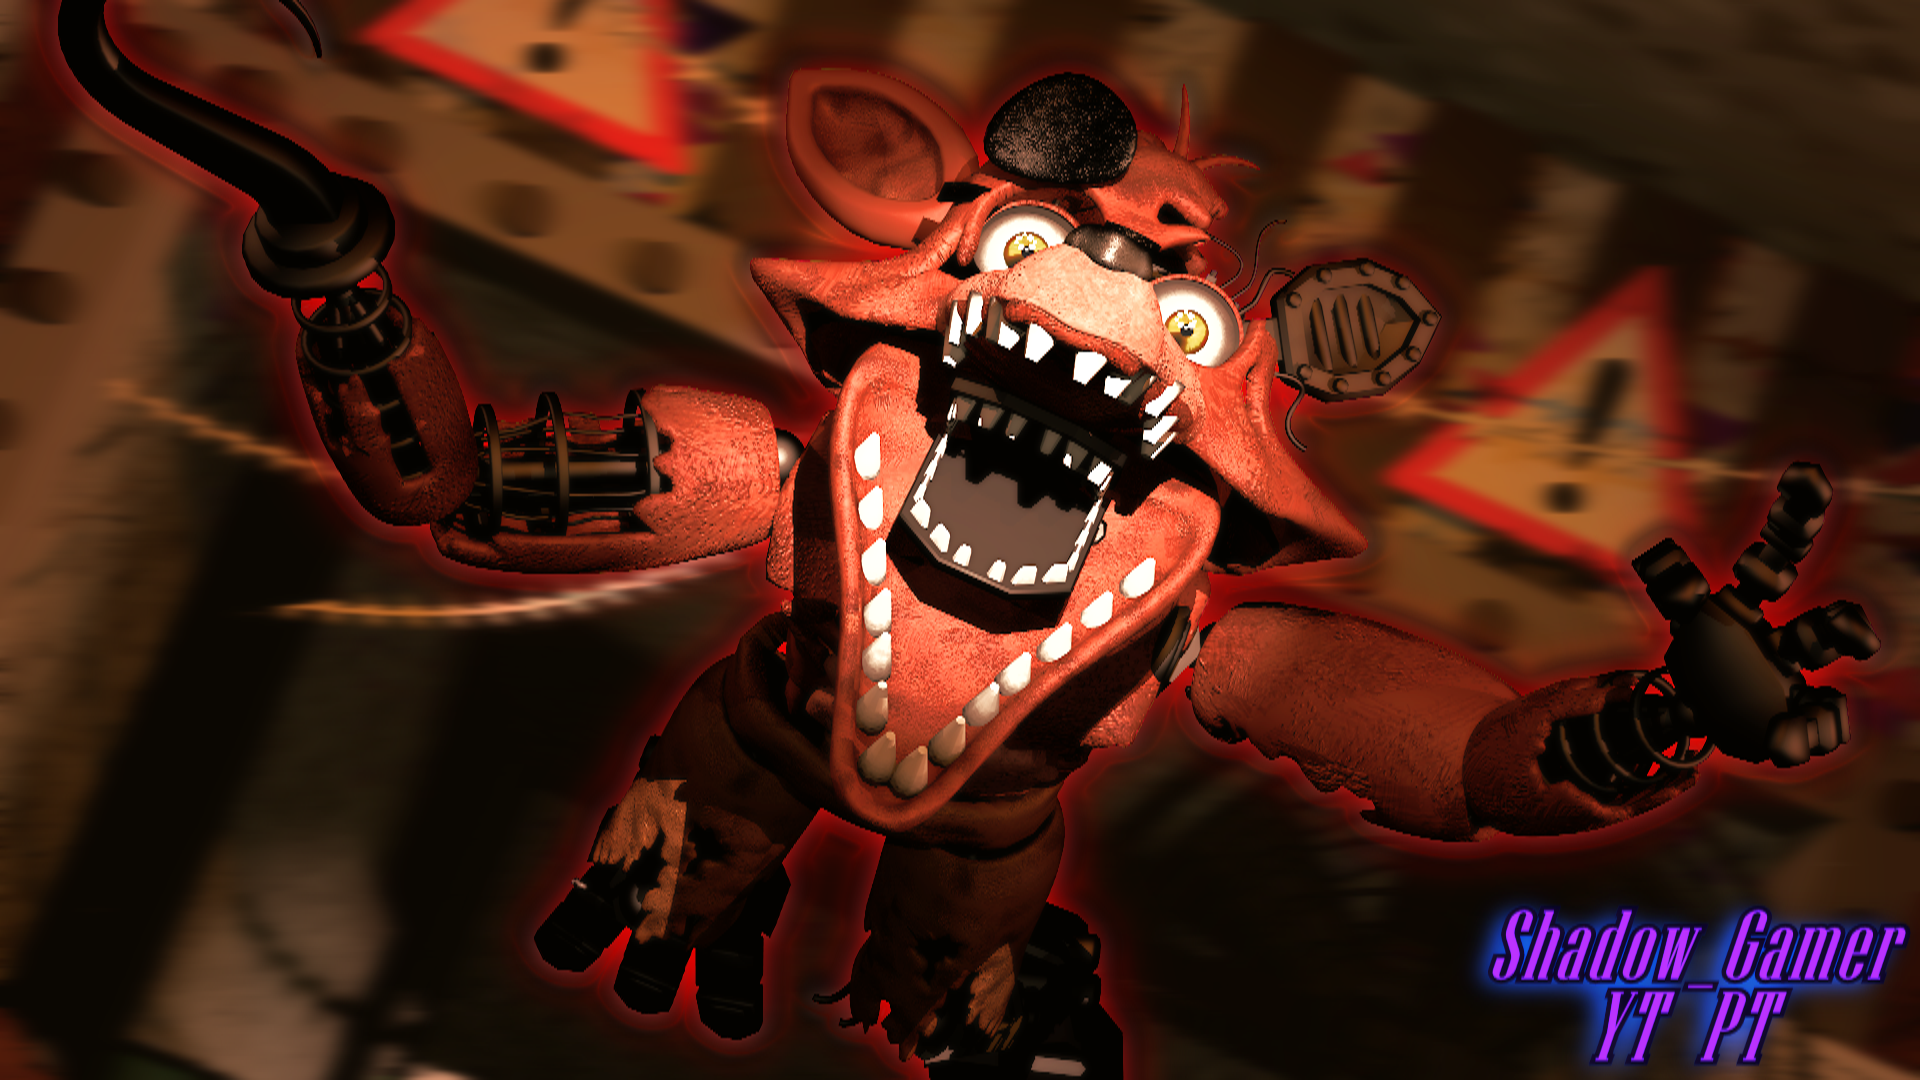 C4d Fnaf2 Withered Foxy Jumpscare By Shadowgamerytpt On Deviantart